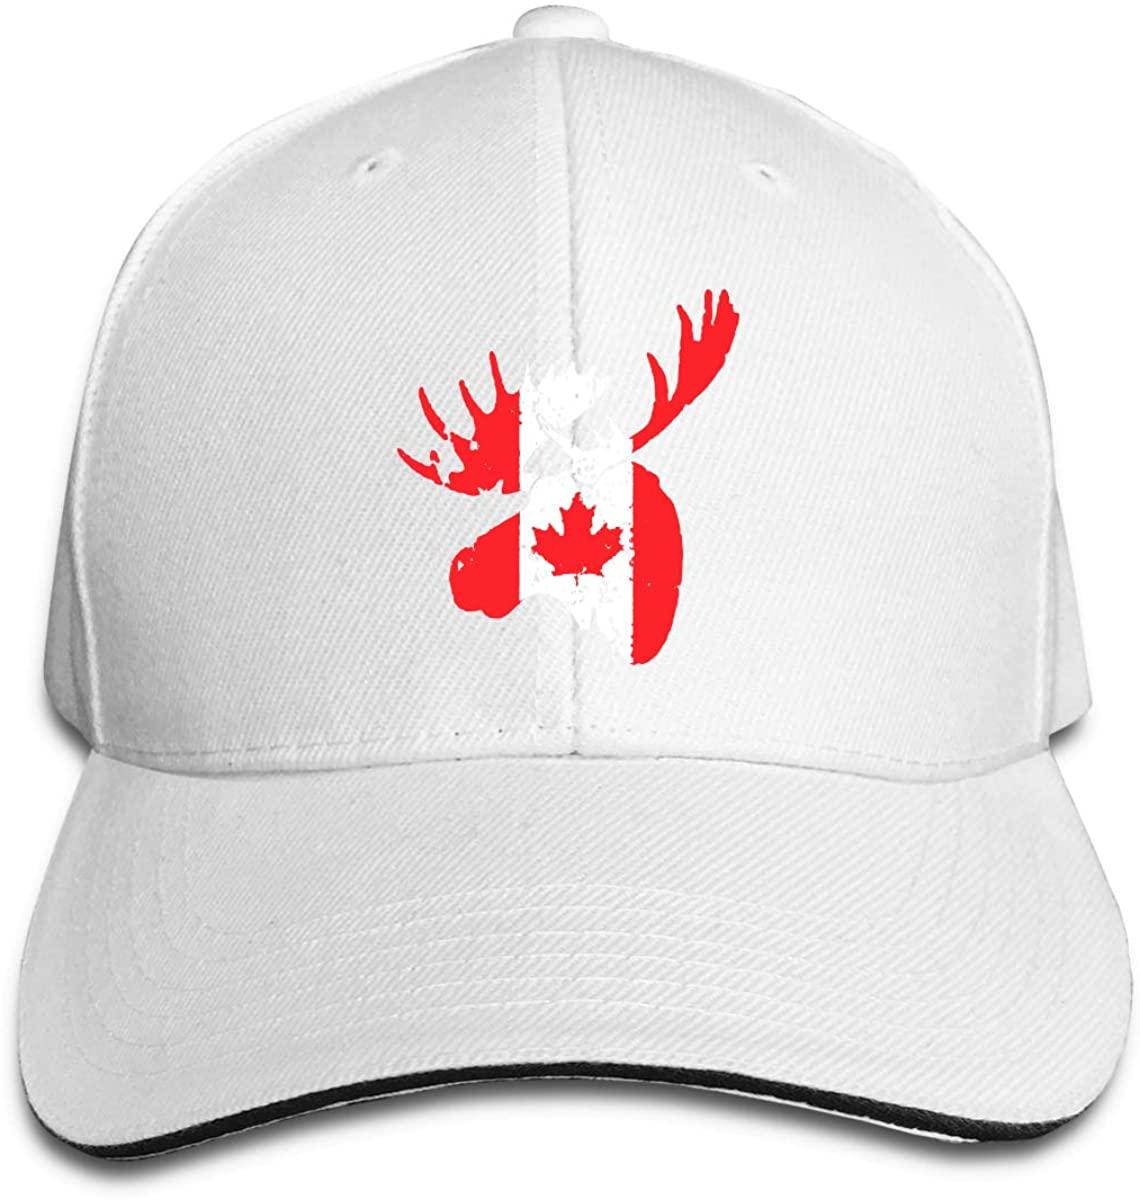 Moose Maple Leaf Canada Unisex Sandwich Baseball Cap Adjustable Snapback Hat Hunting Casquette